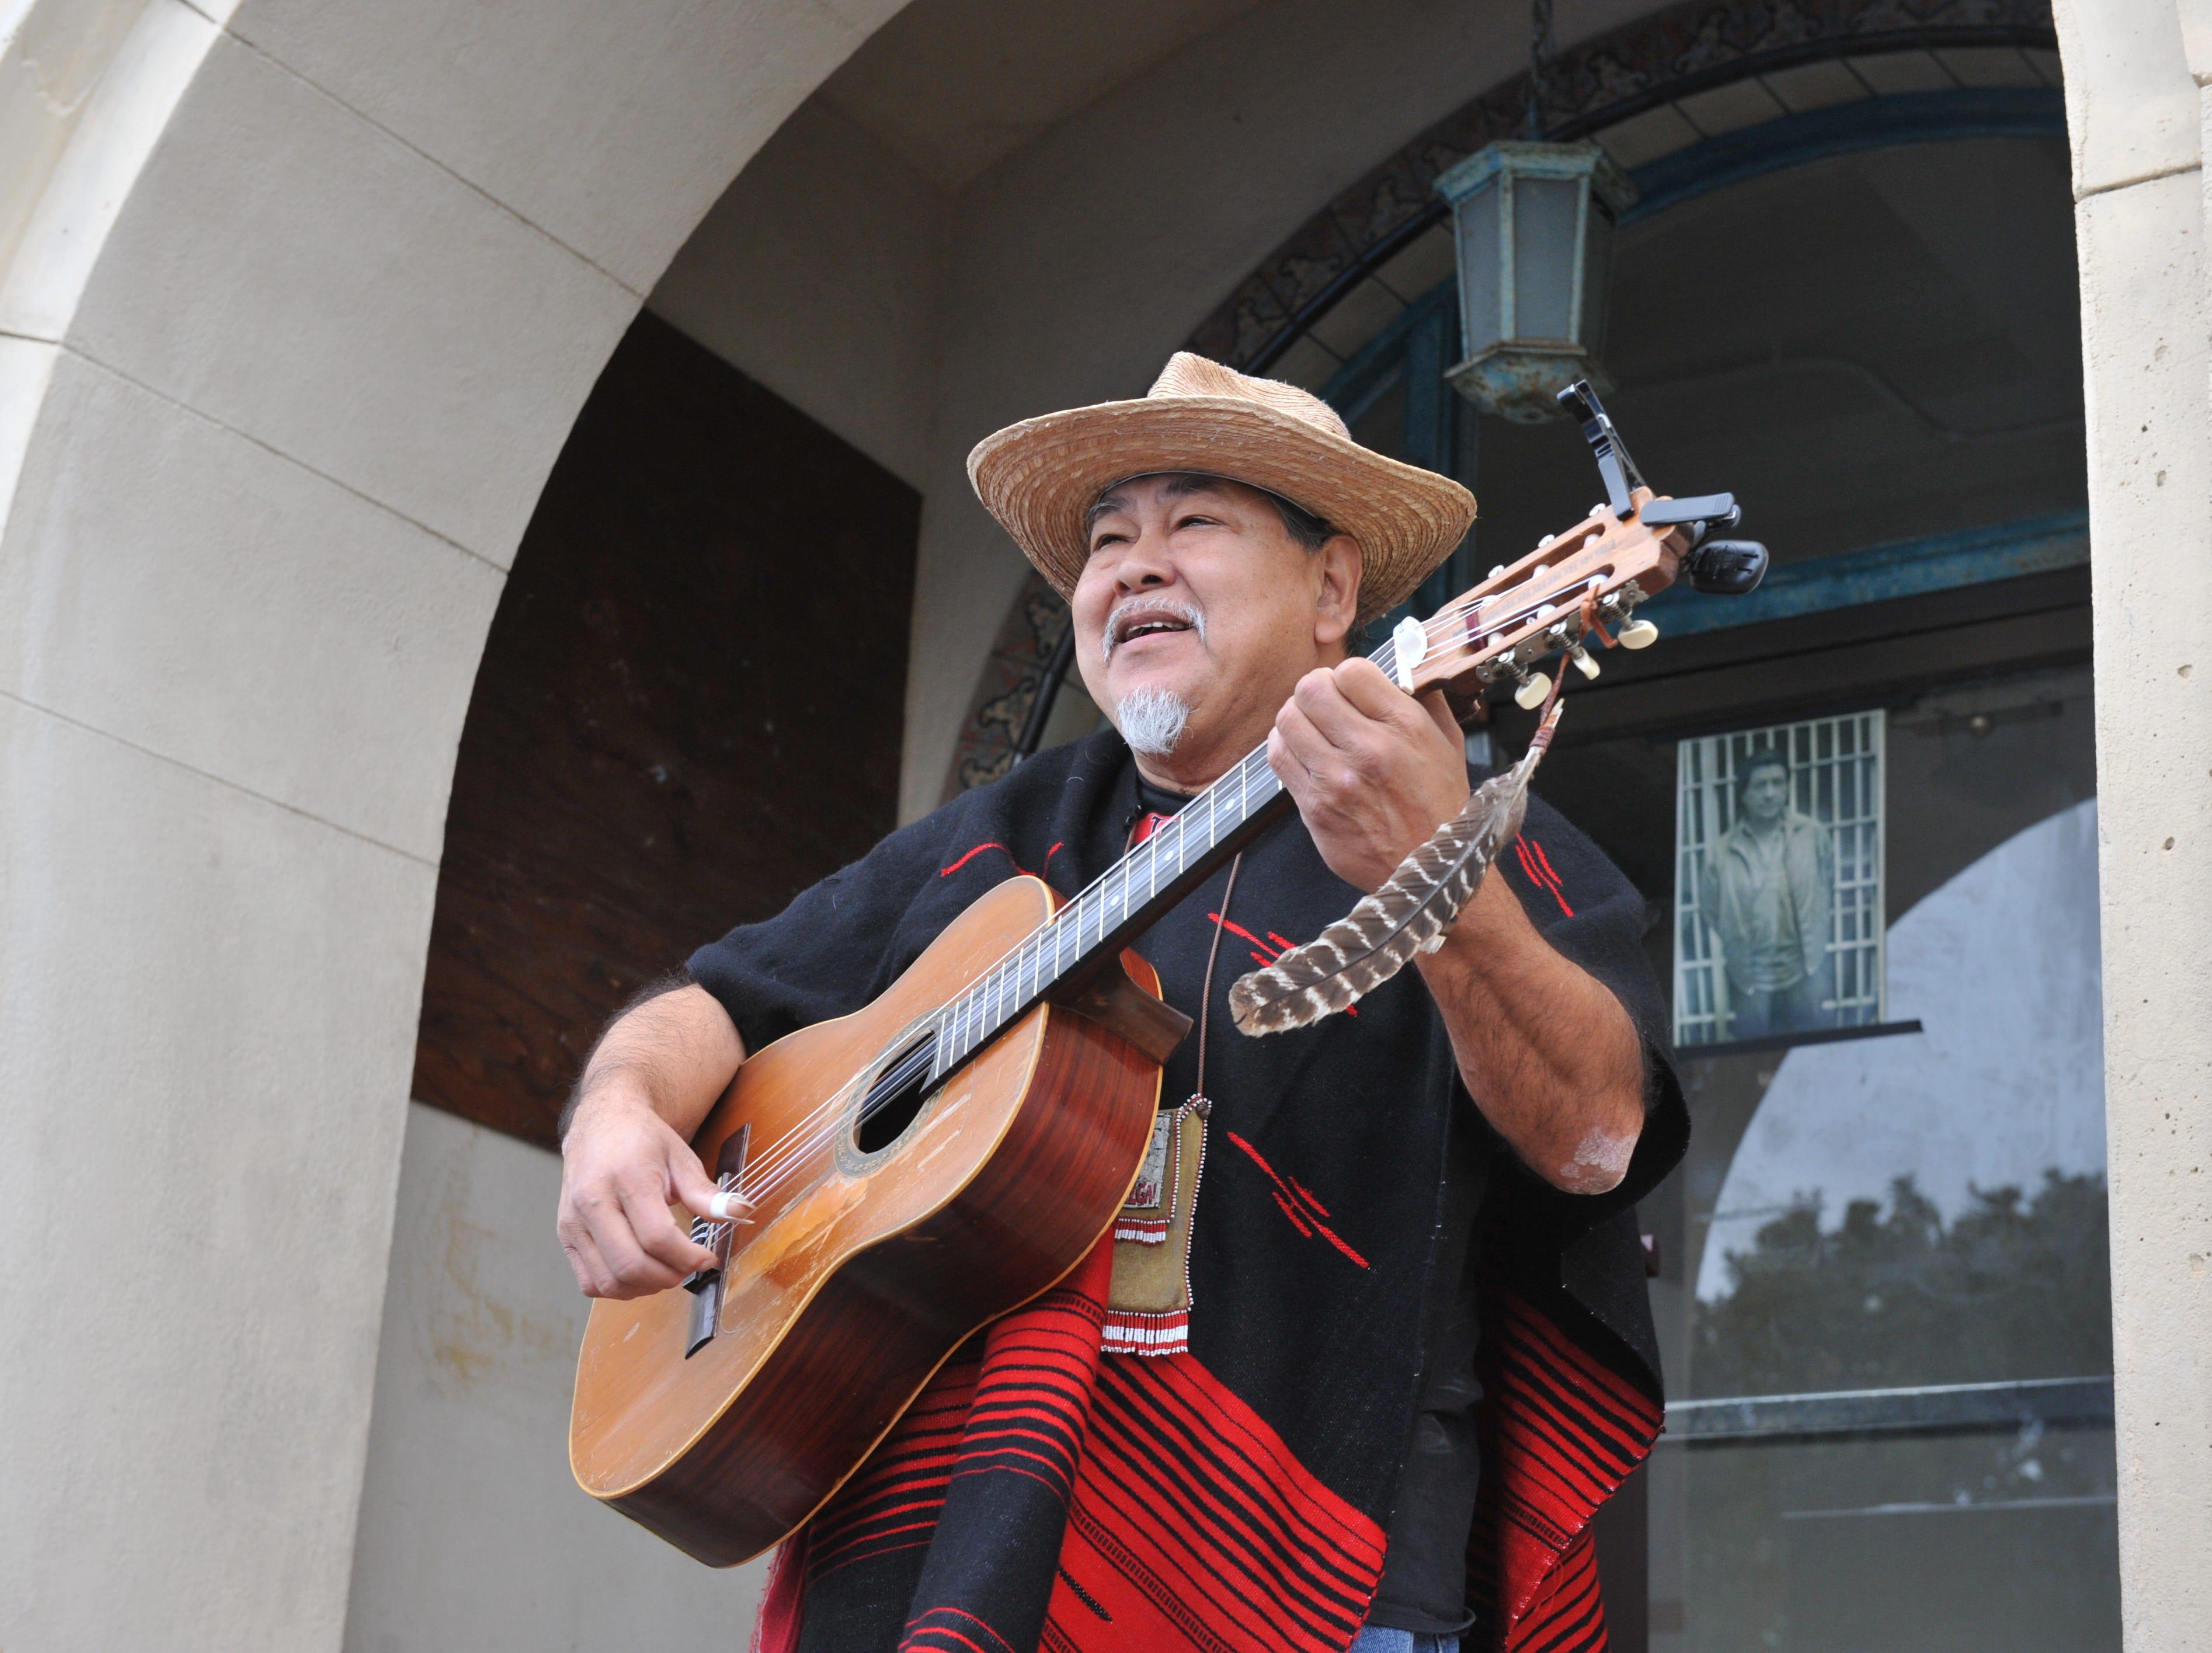 Noe Yaocoatl Montoya, 64, sings before the plaque ceremony.